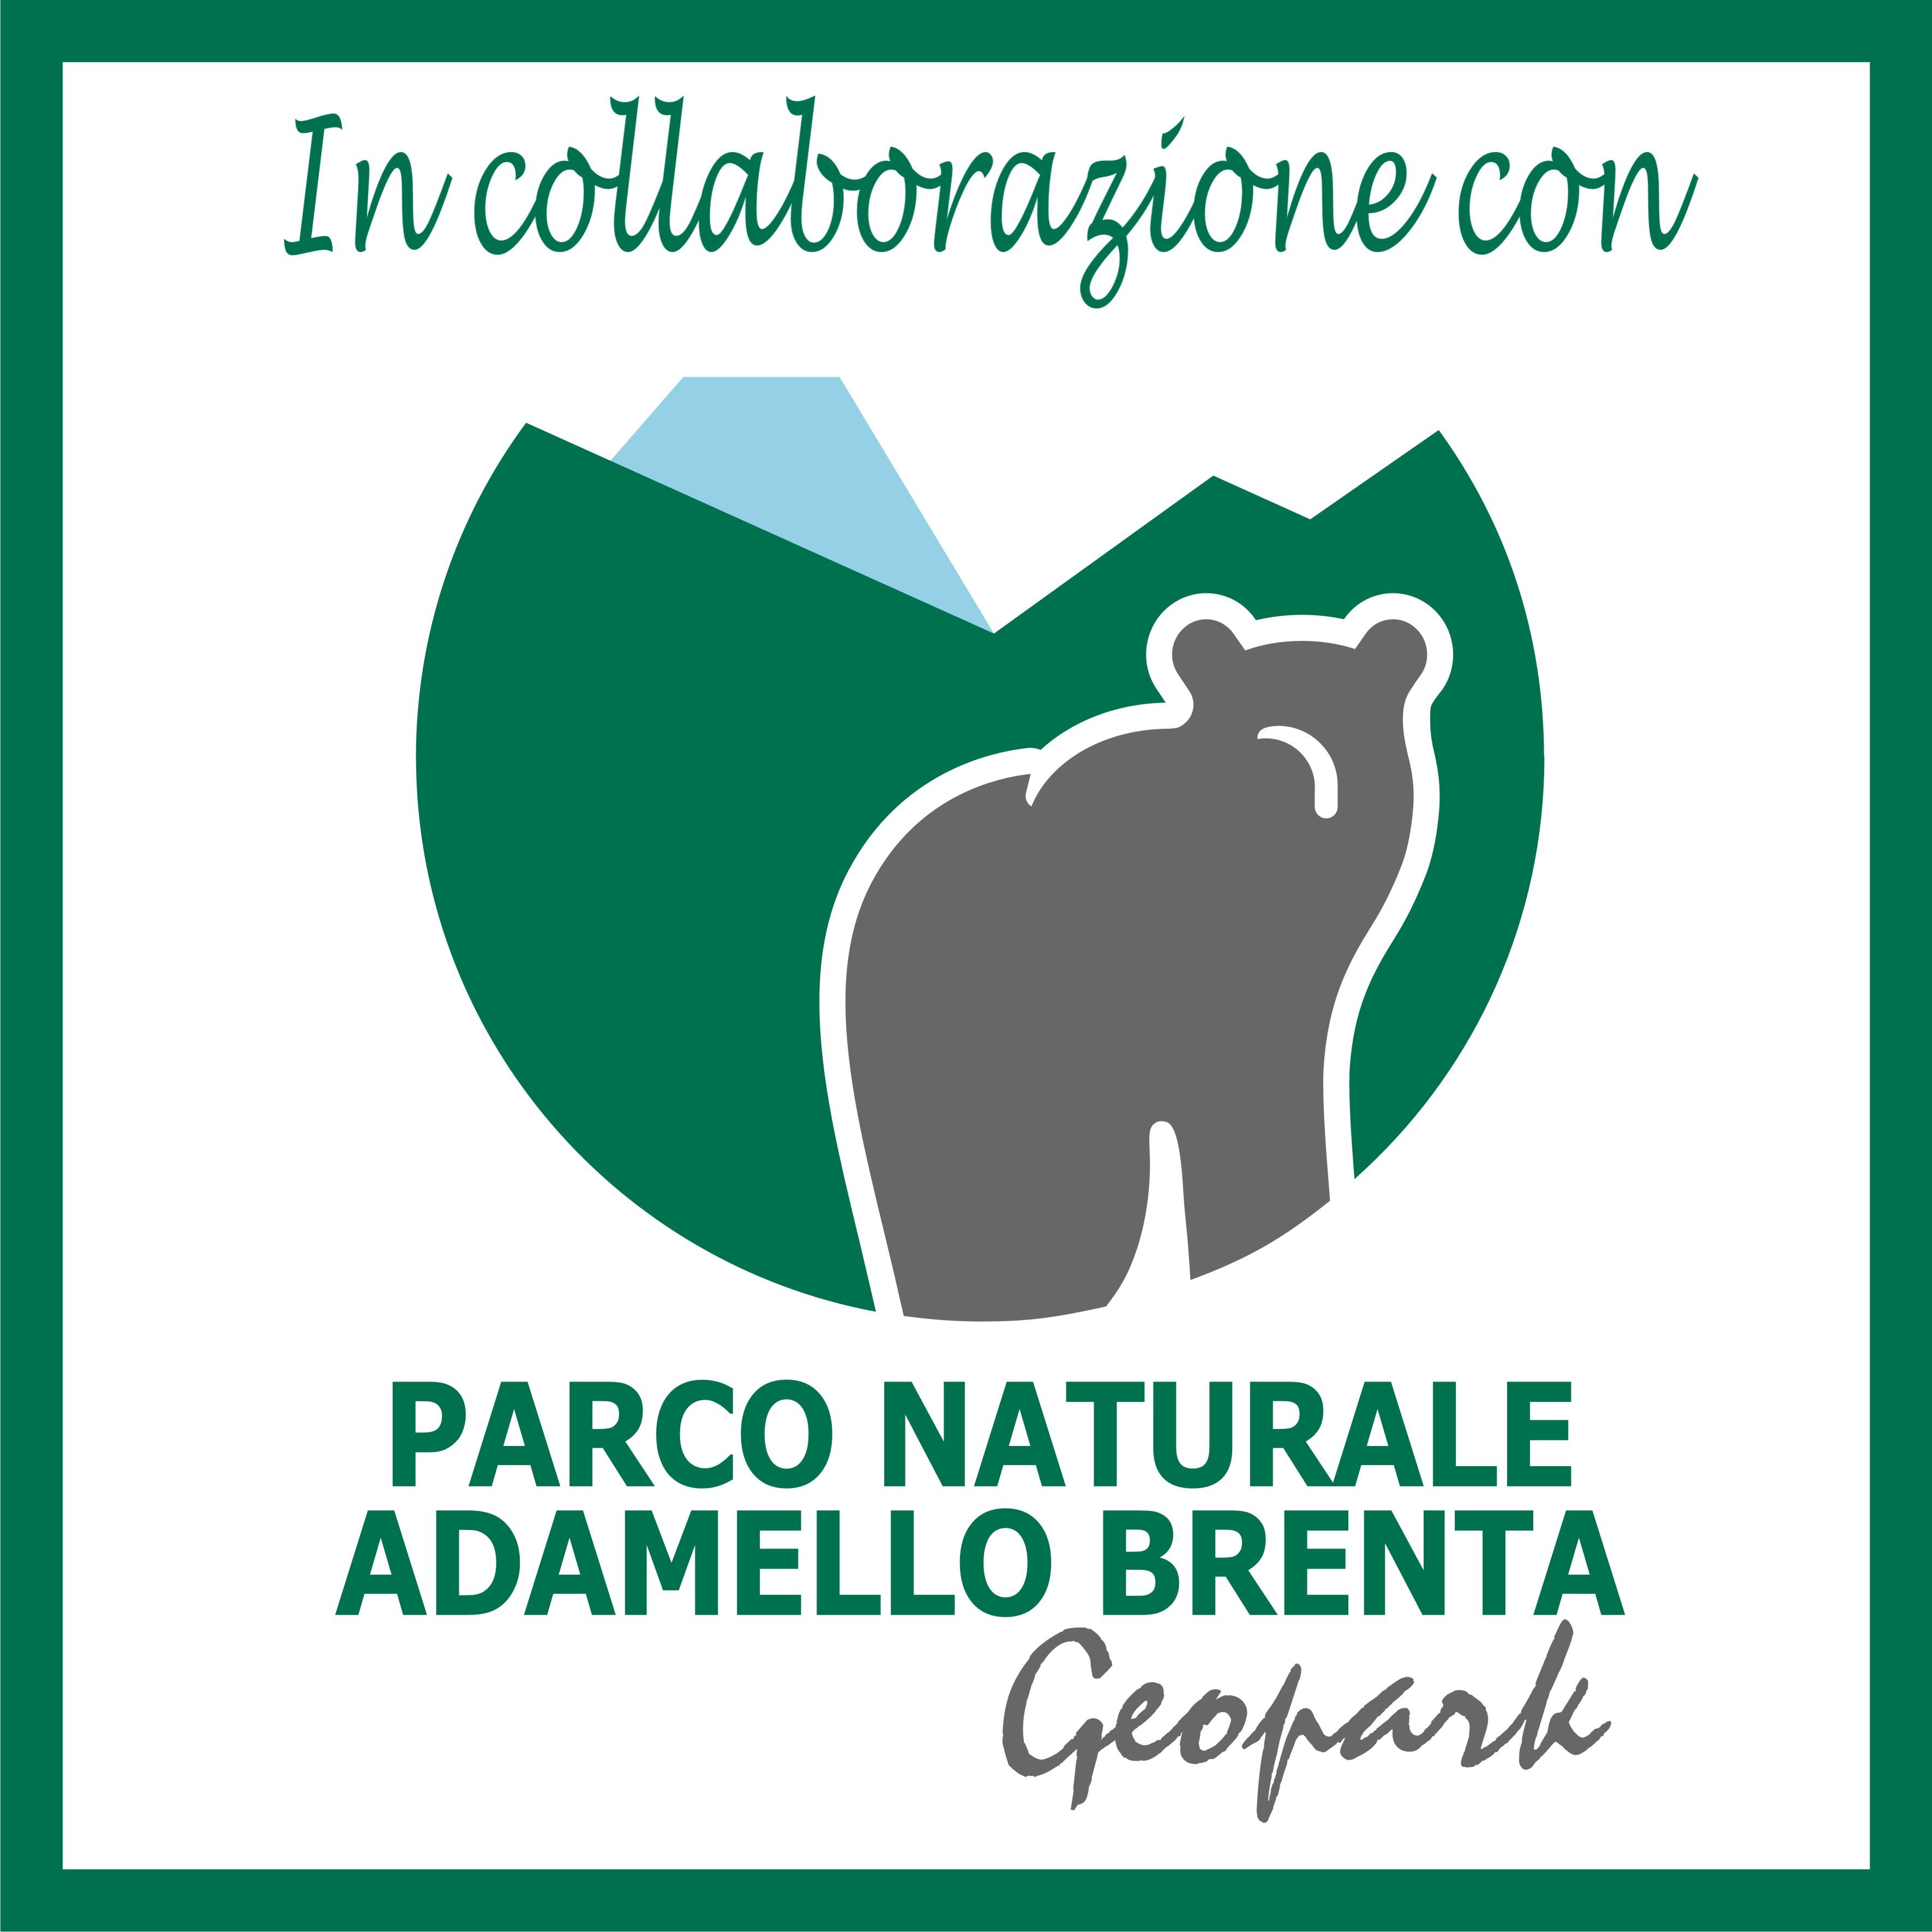 Parco Naturale Adamello Brenta